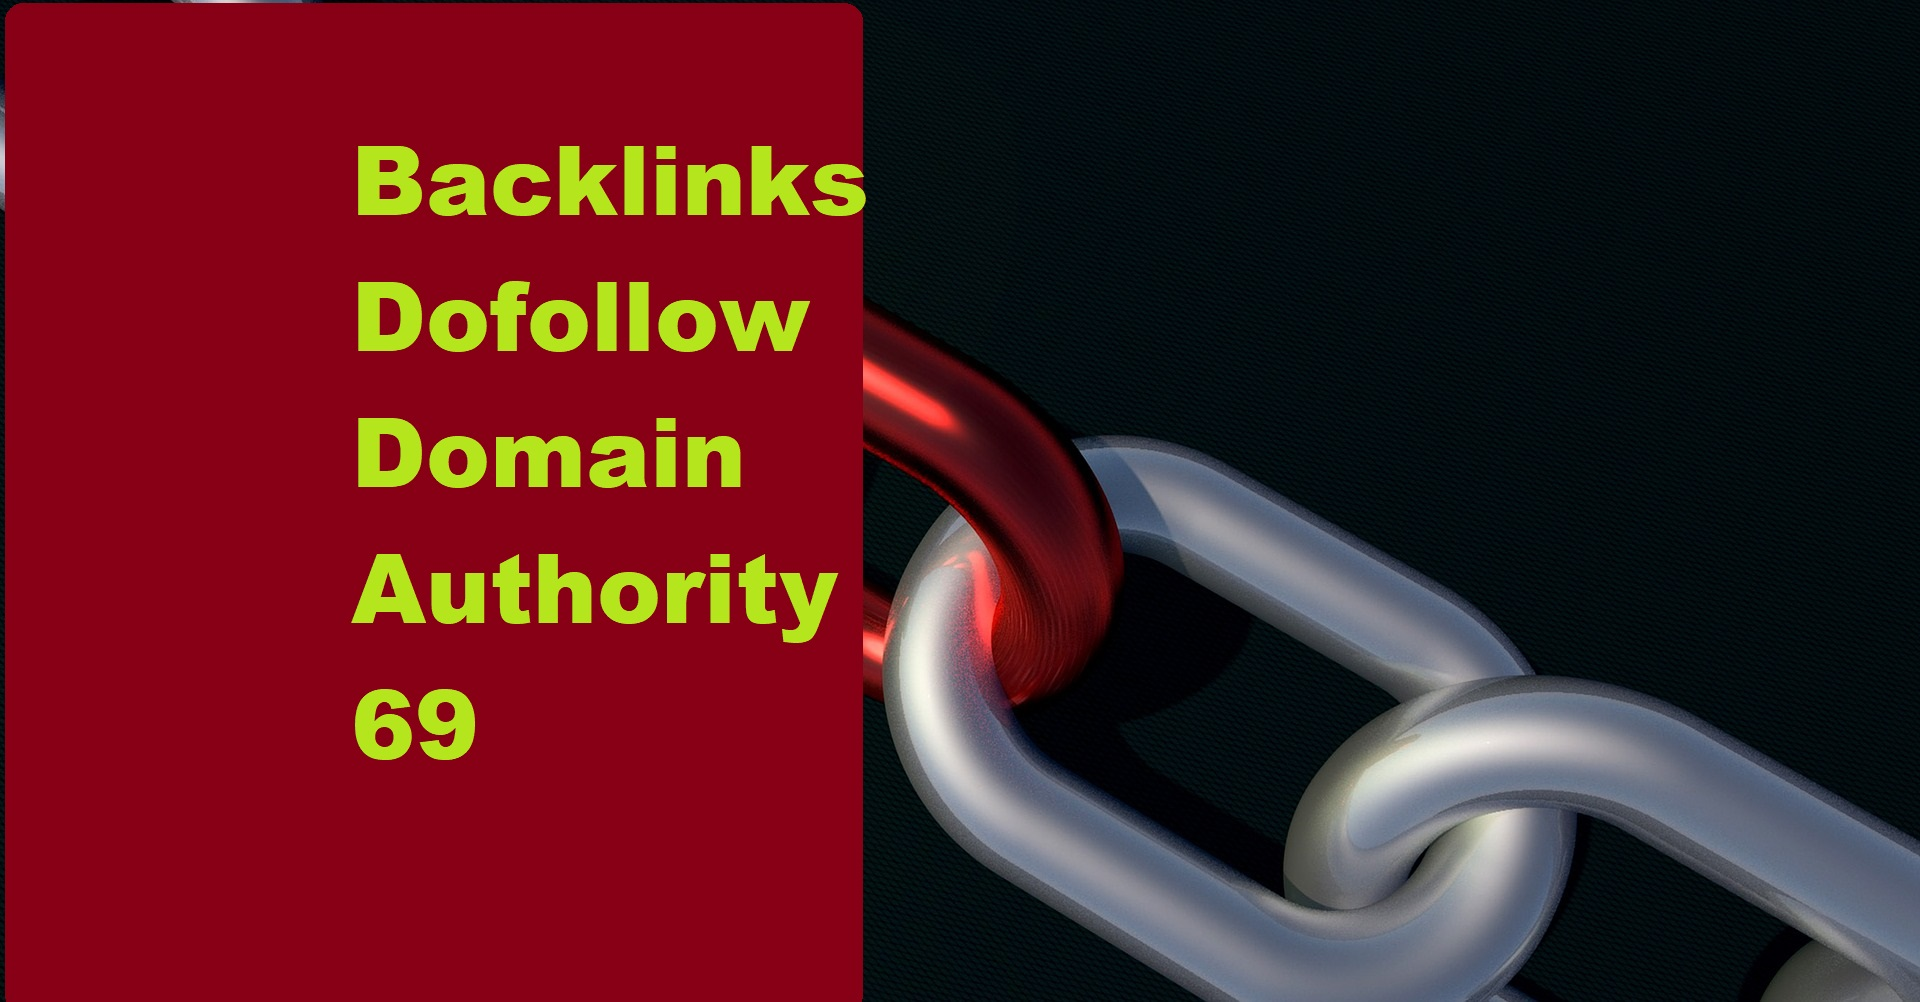 Backlinks Dofollow Domain Authority 69